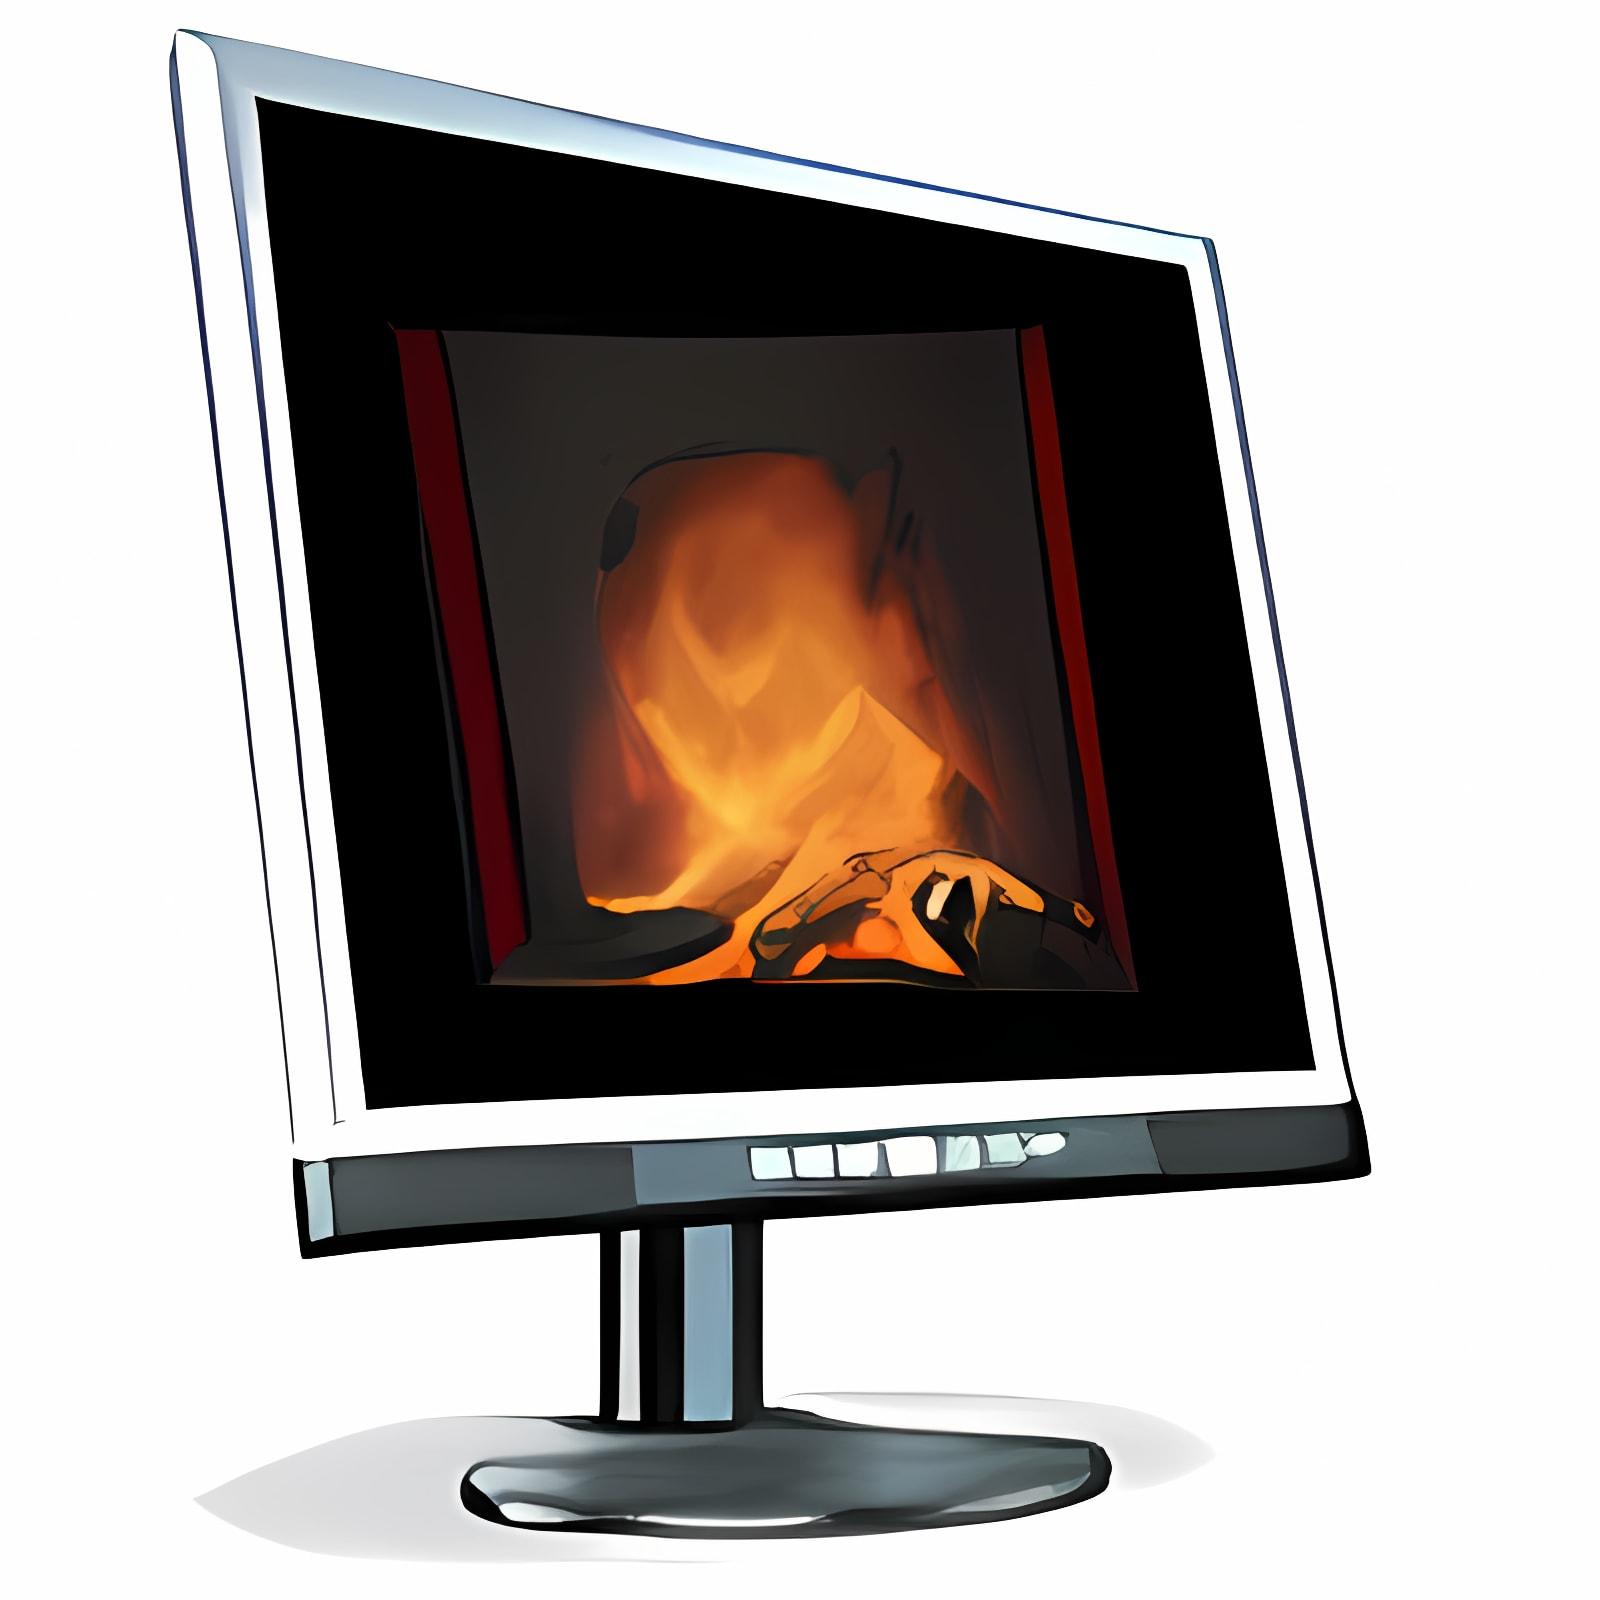 3D Fireplace Screensaver